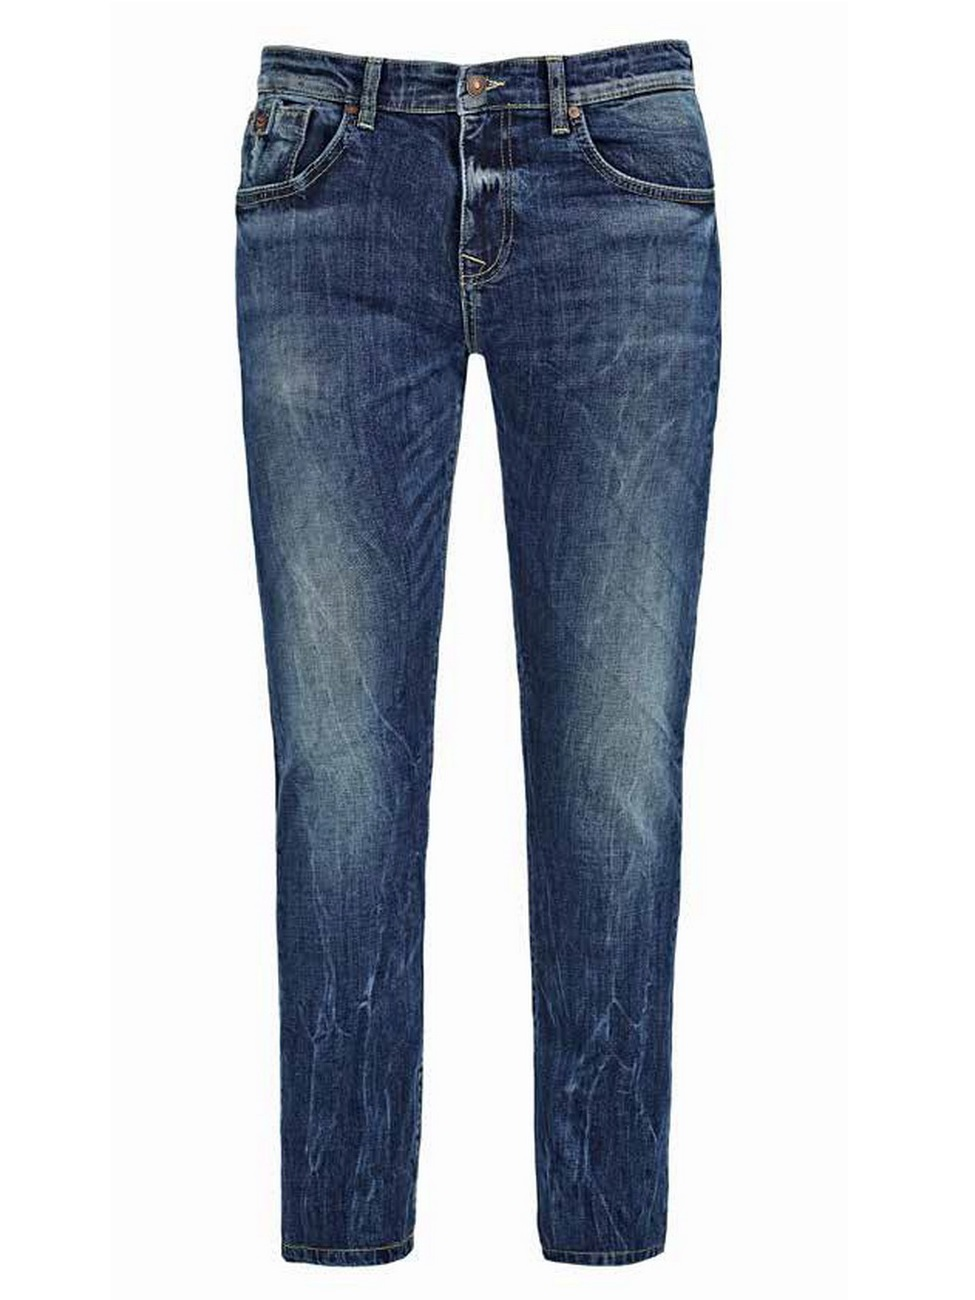 ltb herren jeans joshua slim fit blau troa undamaged. Black Bedroom Furniture Sets. Home Design Ideas